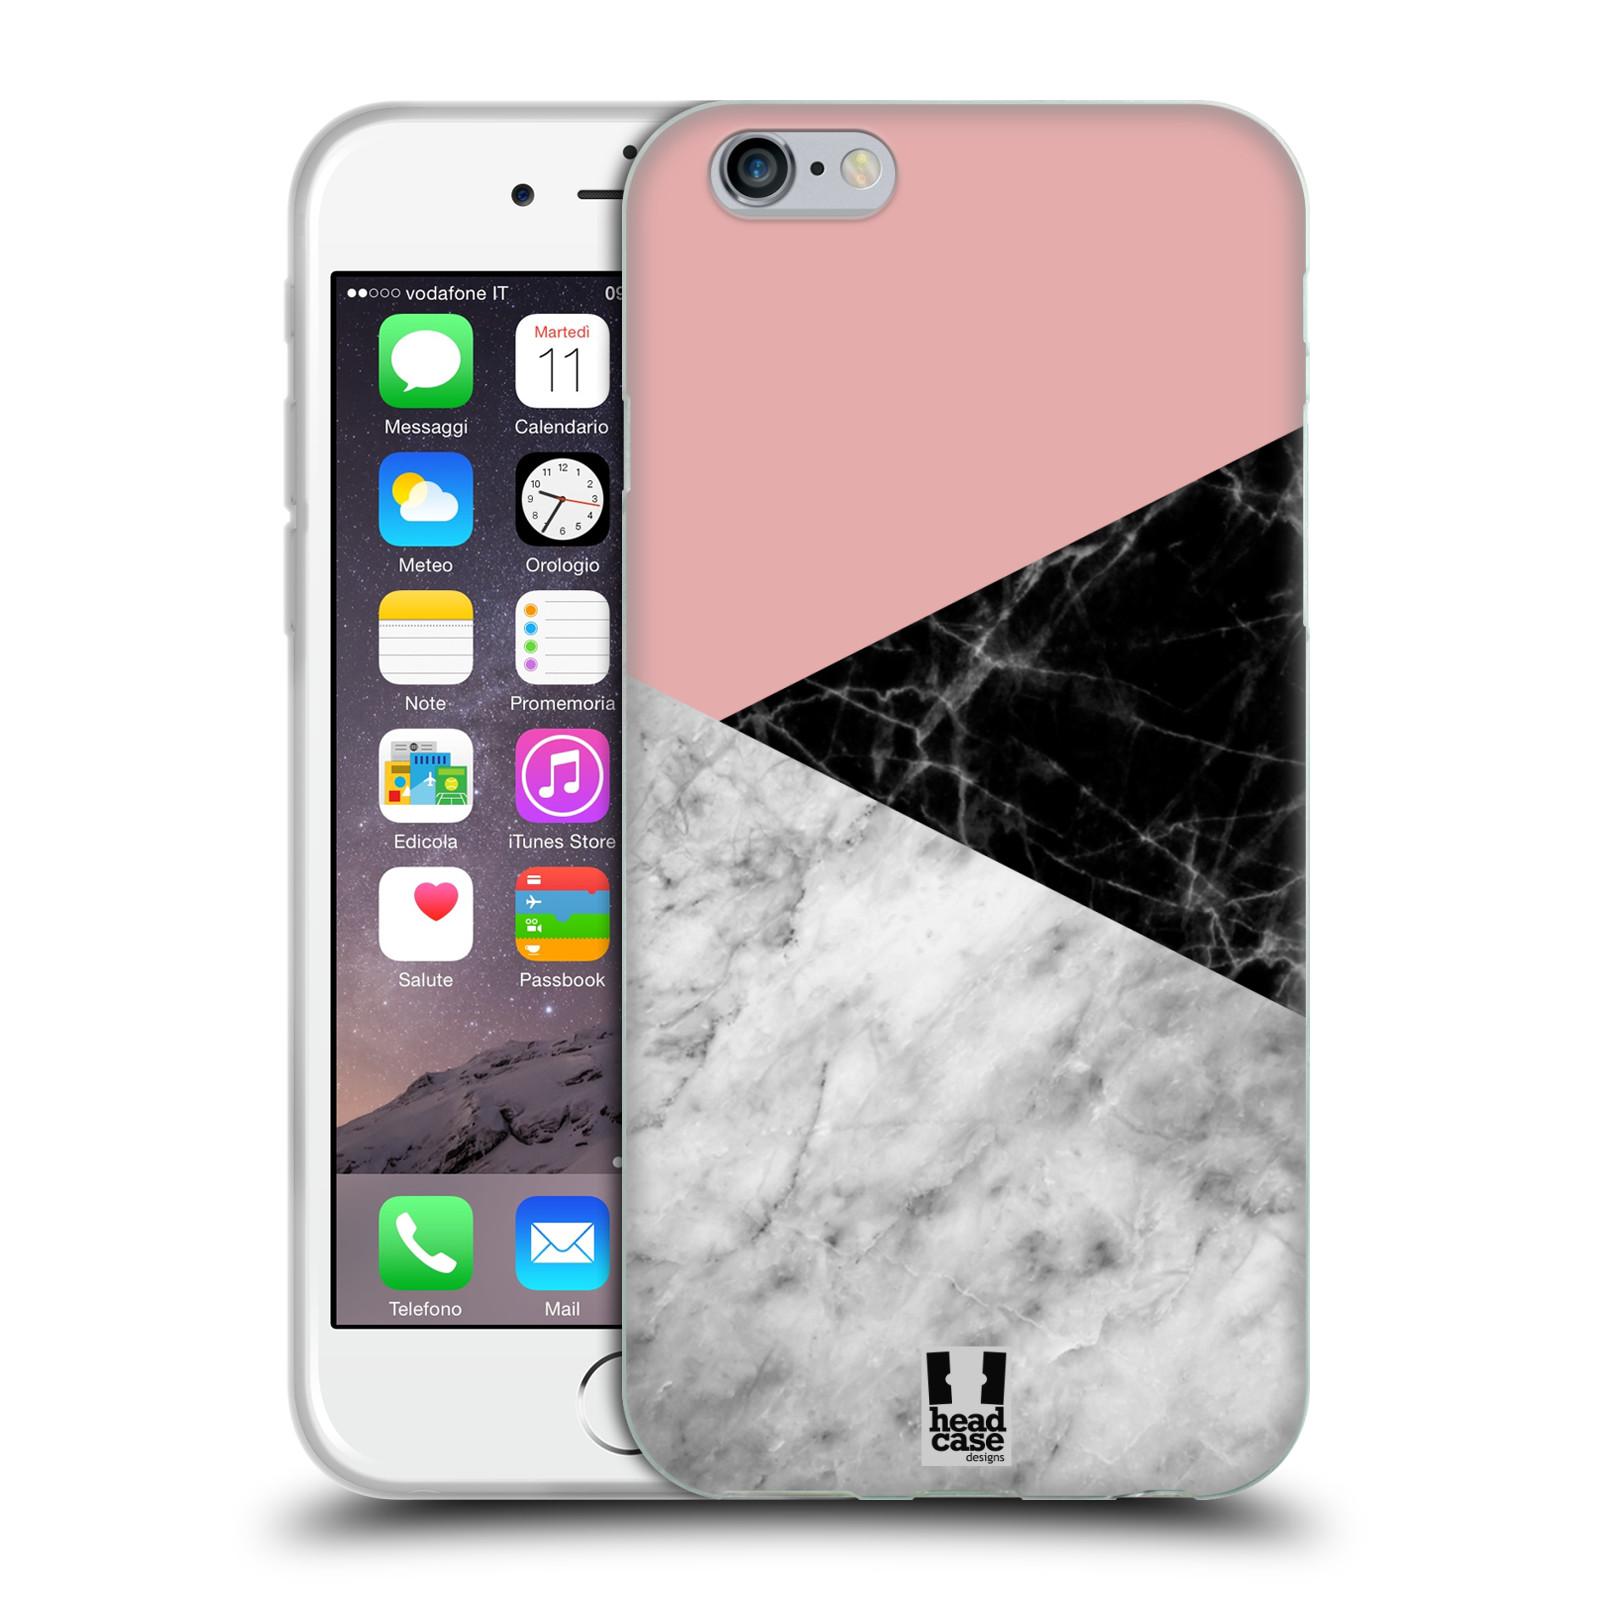 Silikonové pouzdro na mobil Apple iPhone 6 - Head Case - Mramor mix empty d32af474135